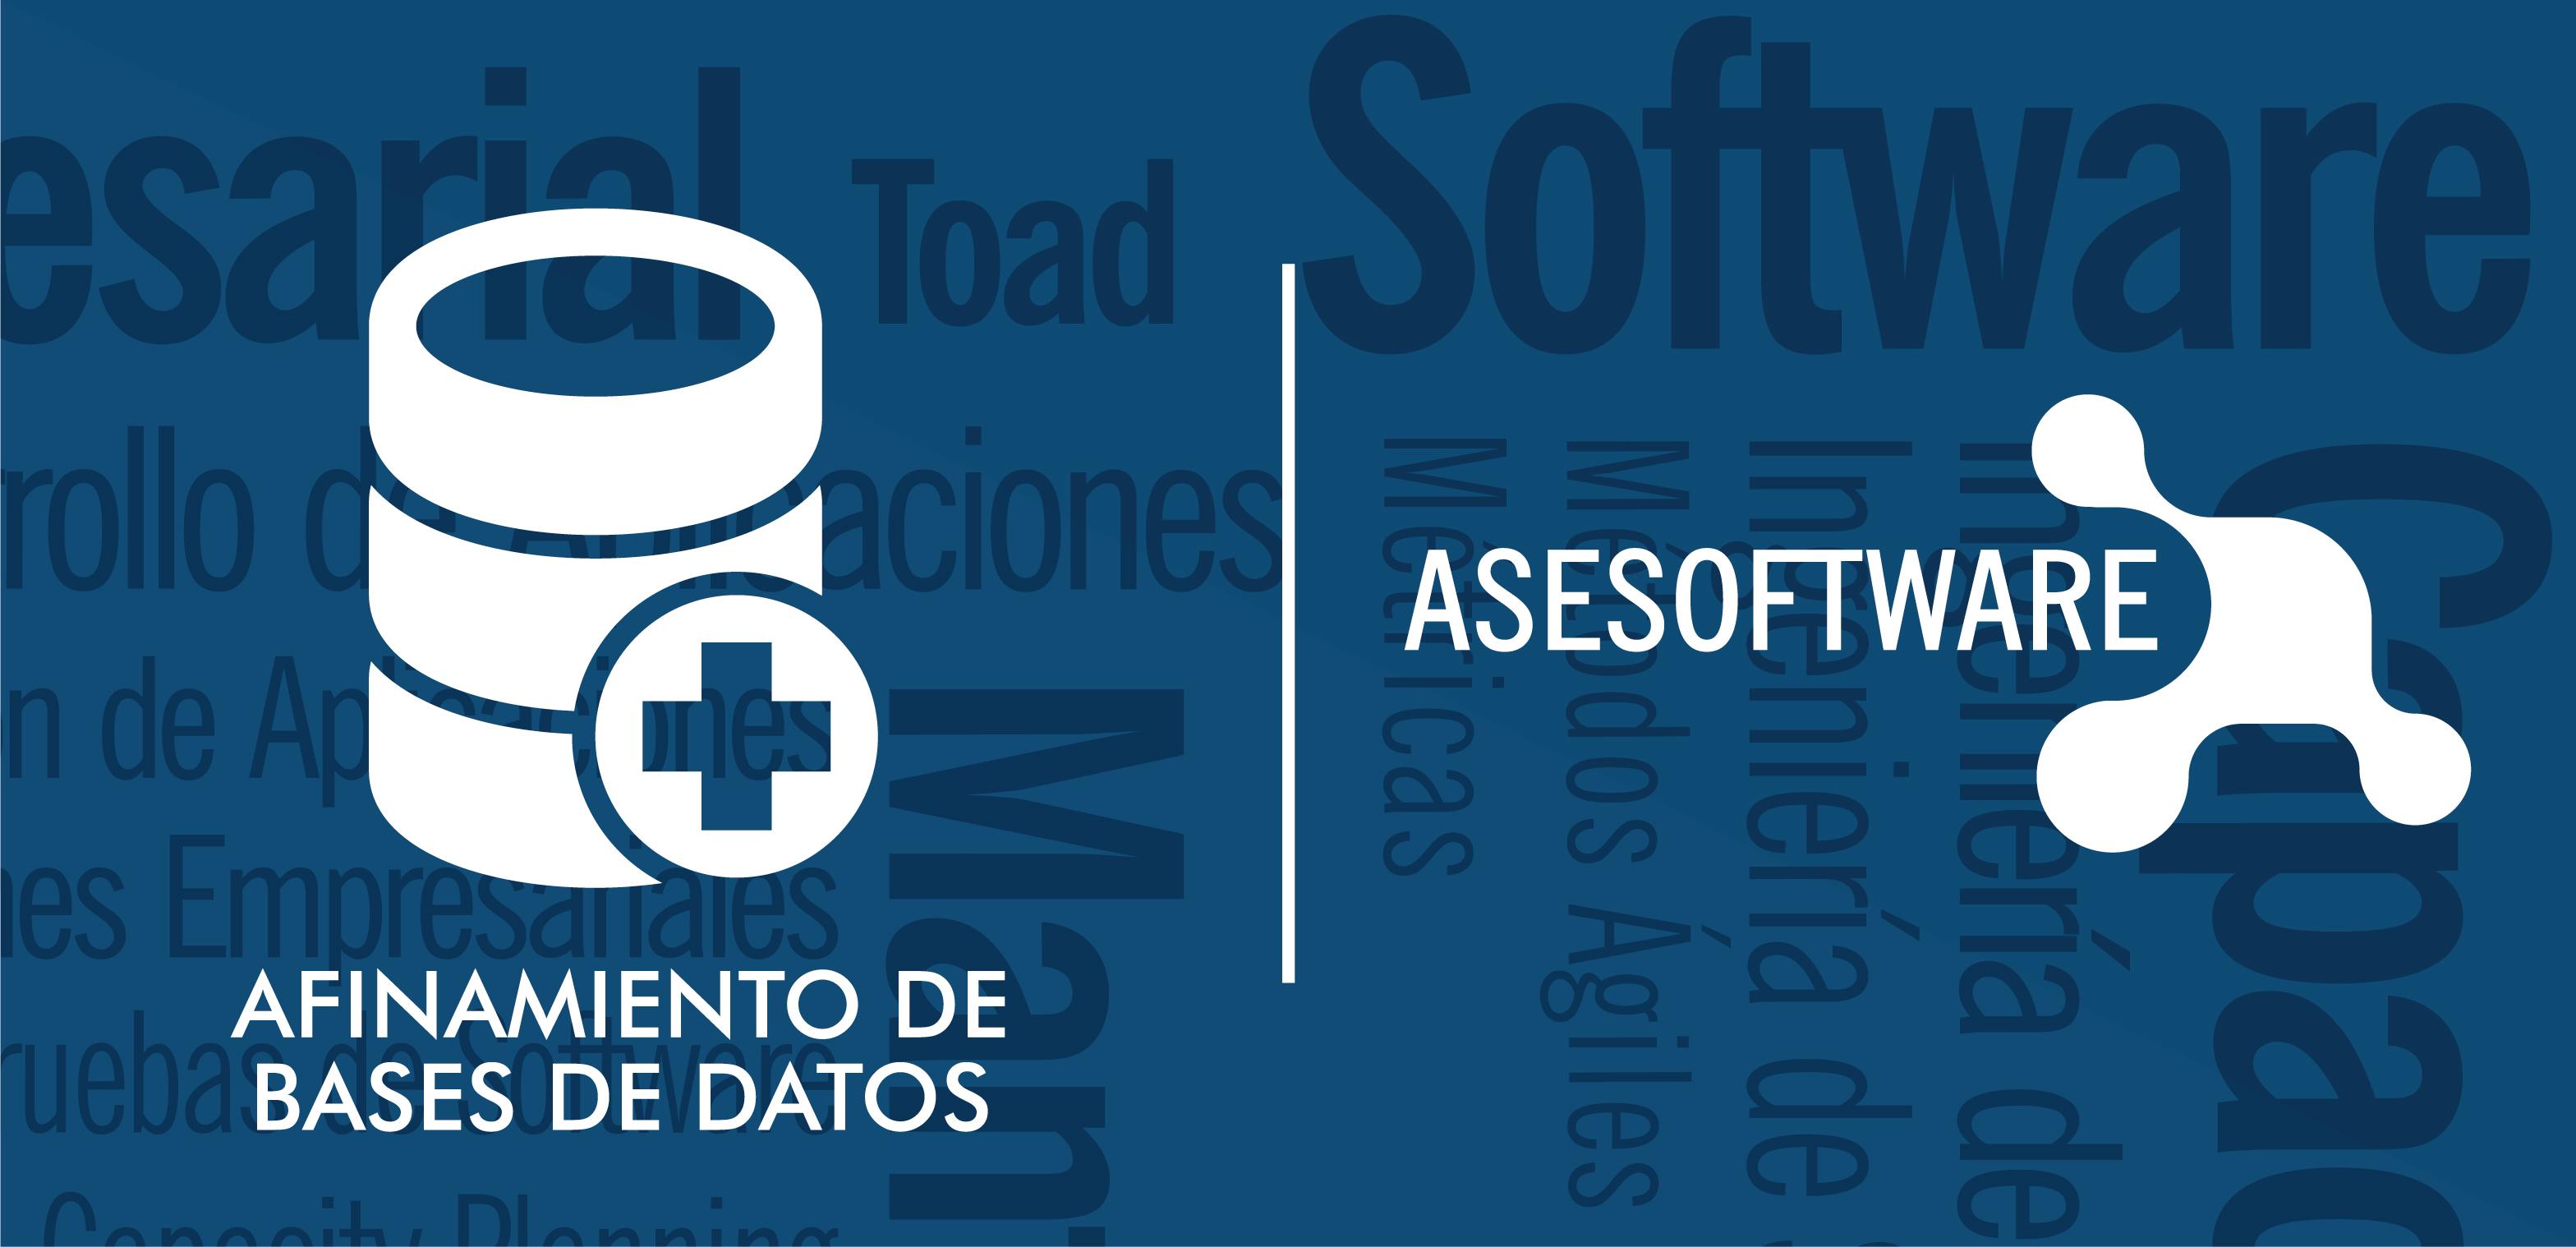 ASESOFTWARE S.A.S. - Afinamiento De Bases De Datos